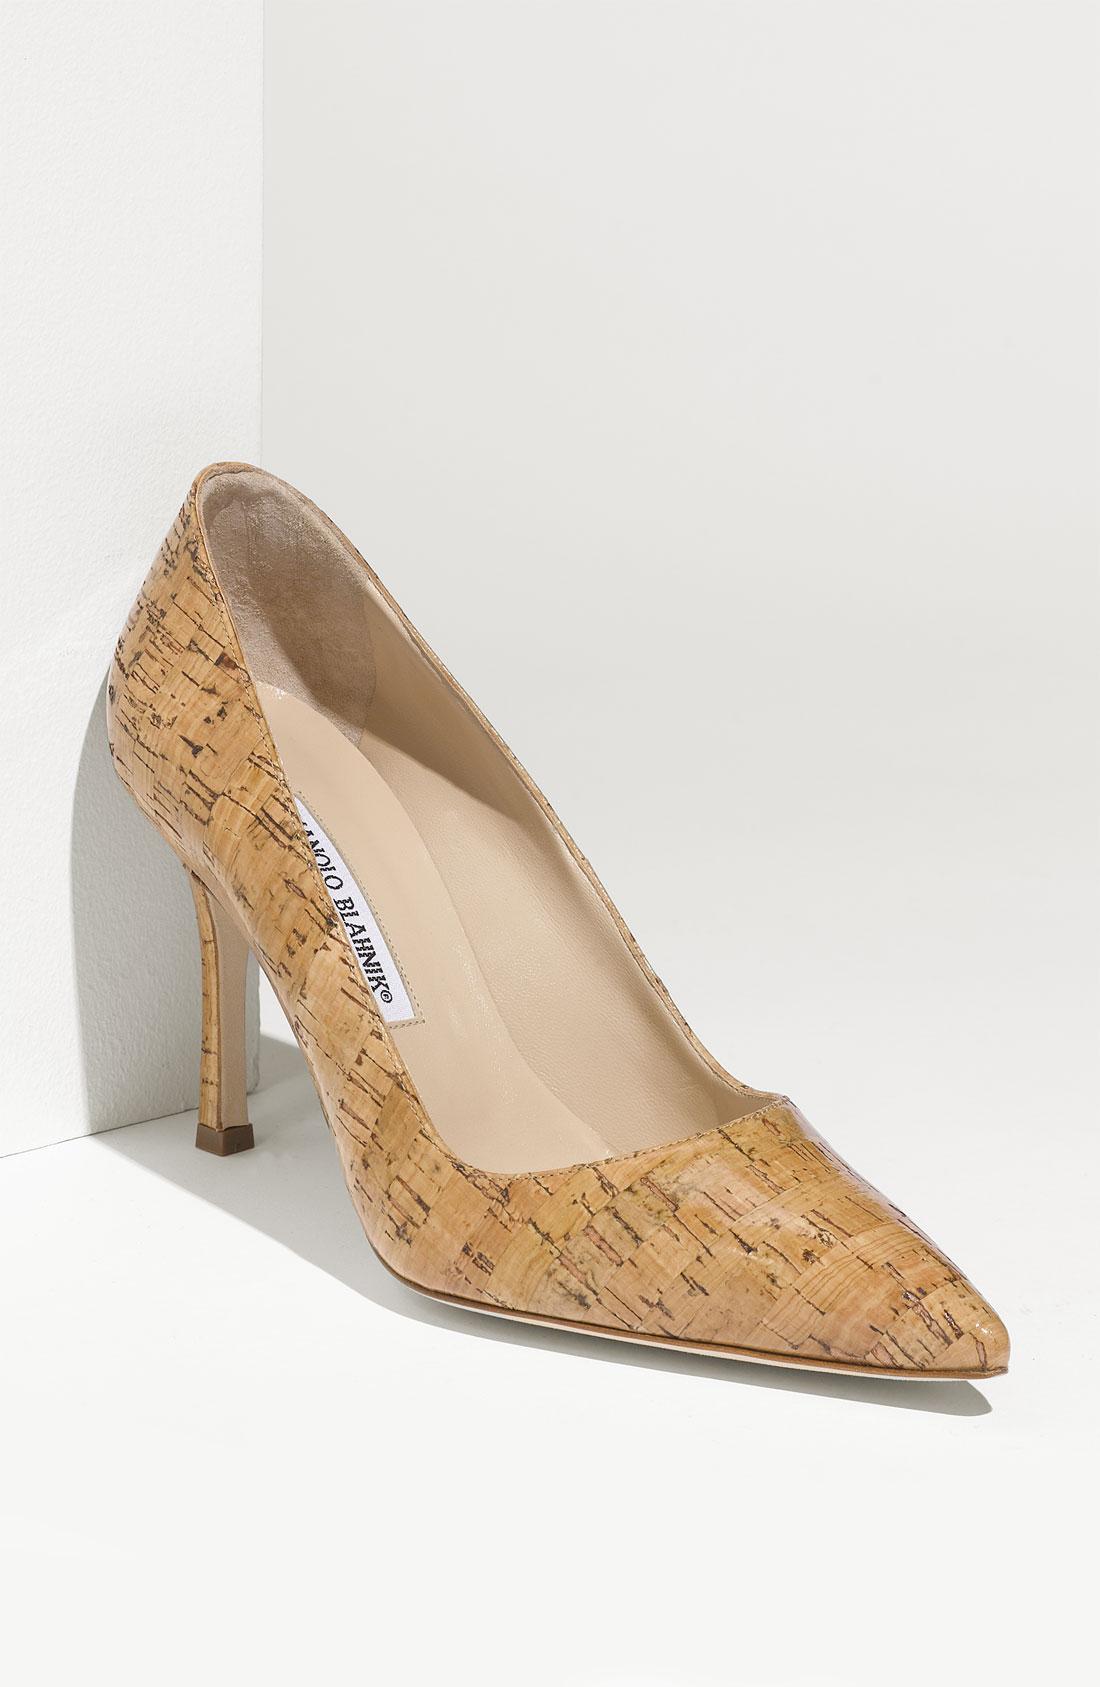 Jimmy Choo Shoes Sale Nordstrom